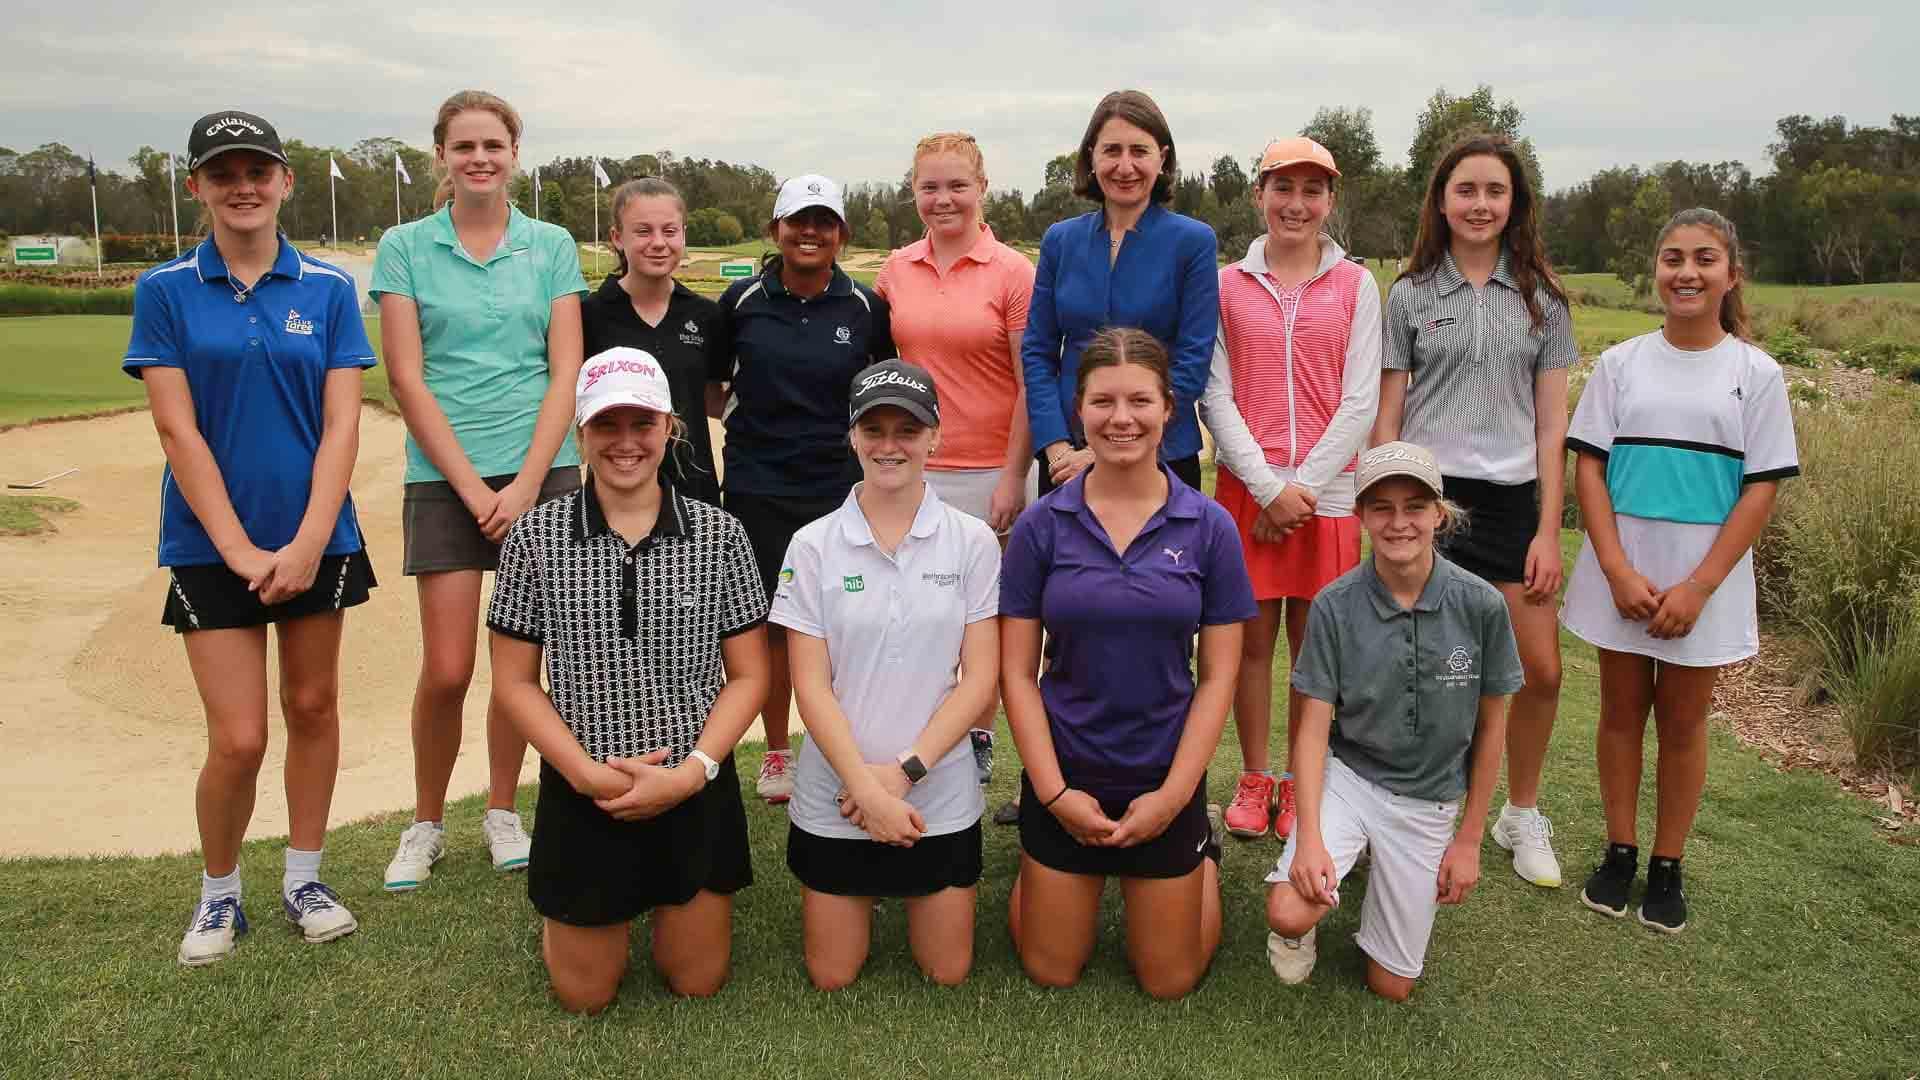 Gladys Berejiklian at the AVJennings NSW Open